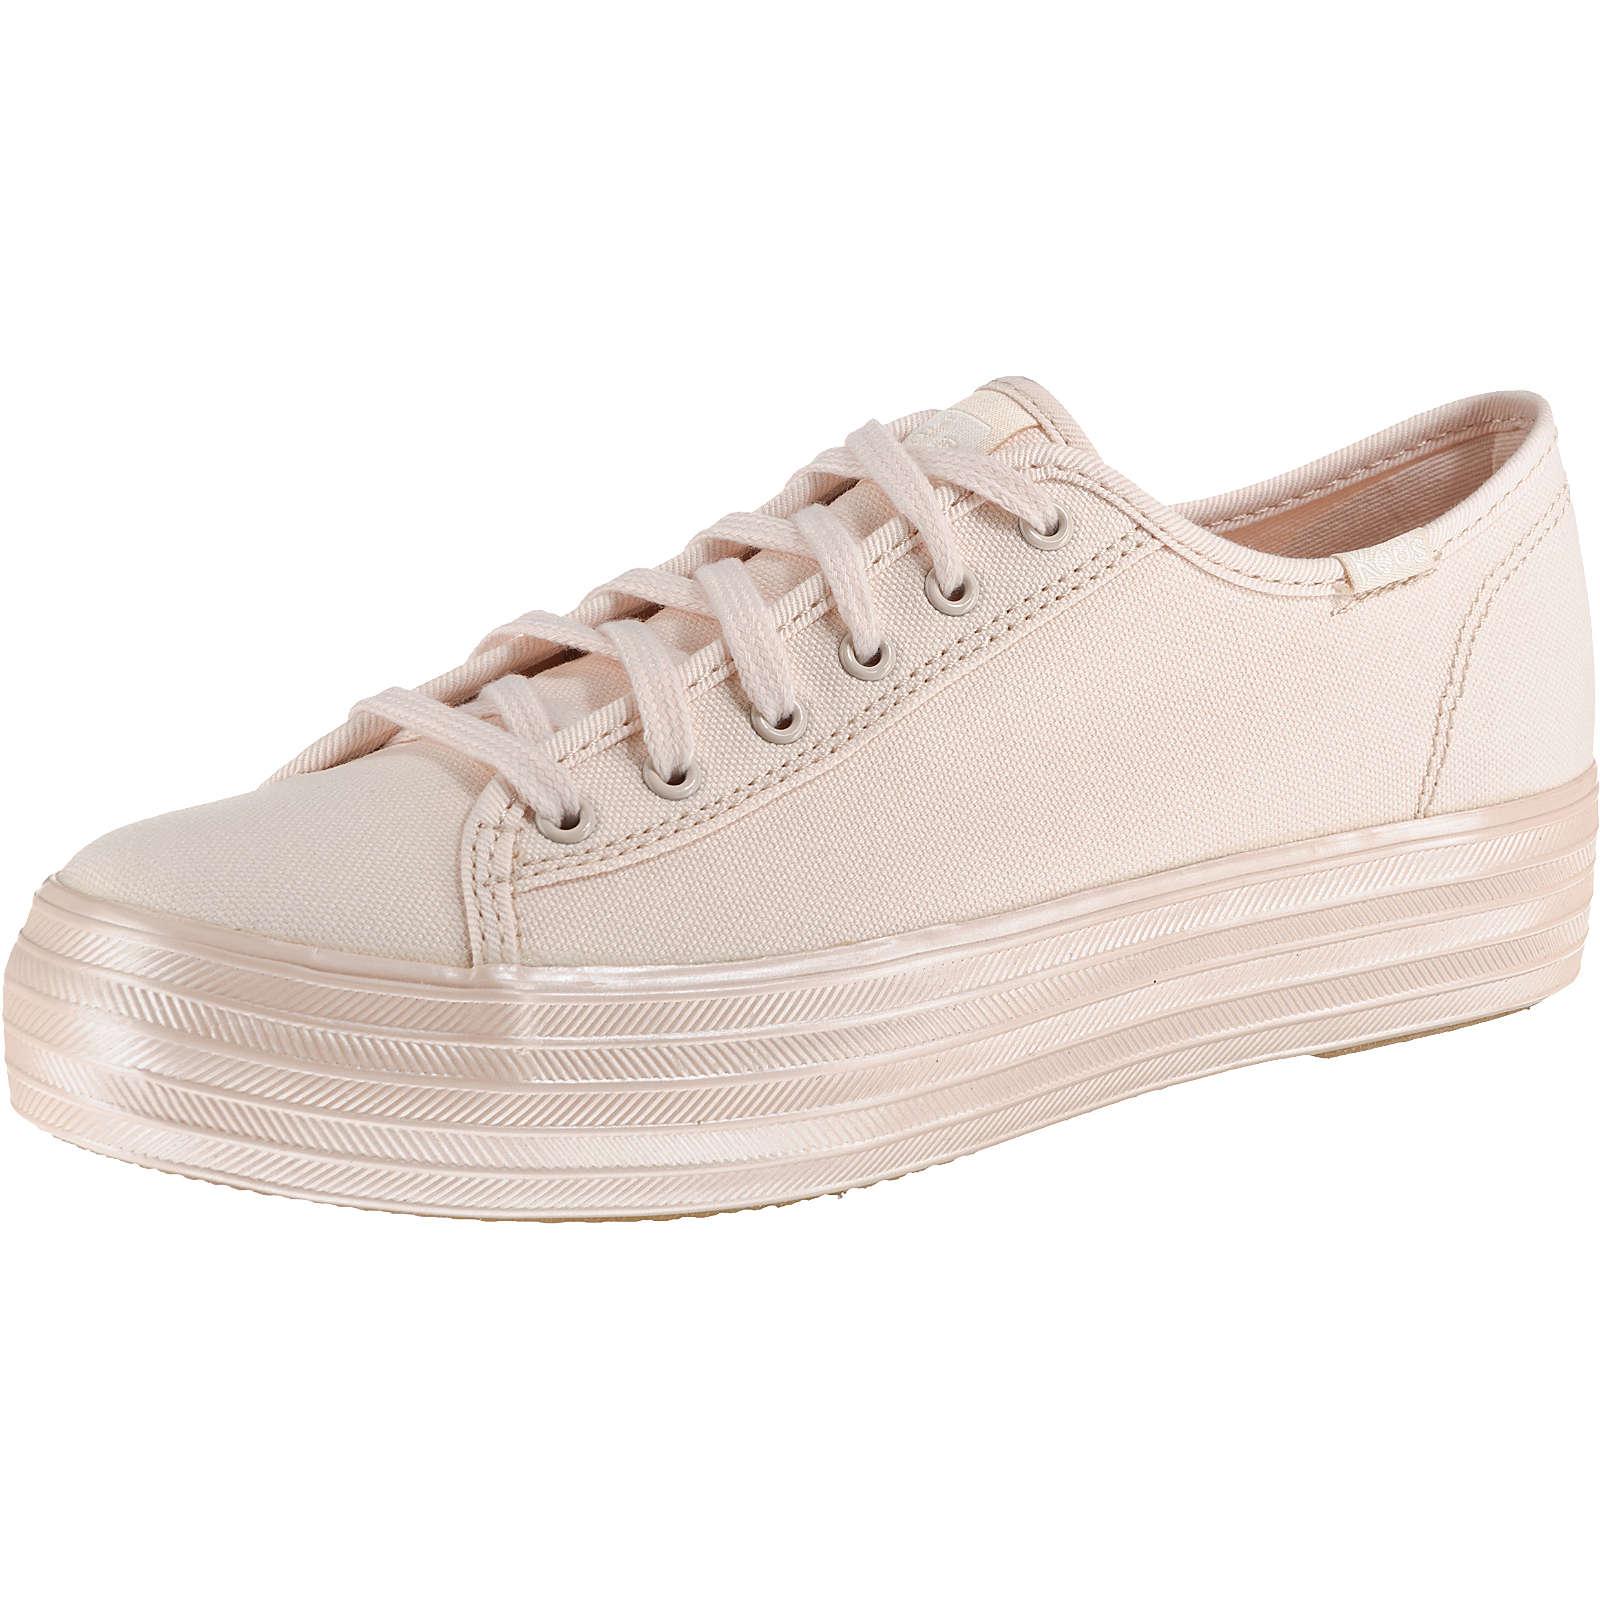 Keds TPL Kick Shimmer Canvas Pink Sneakers Low rosa Damen Gr. 39